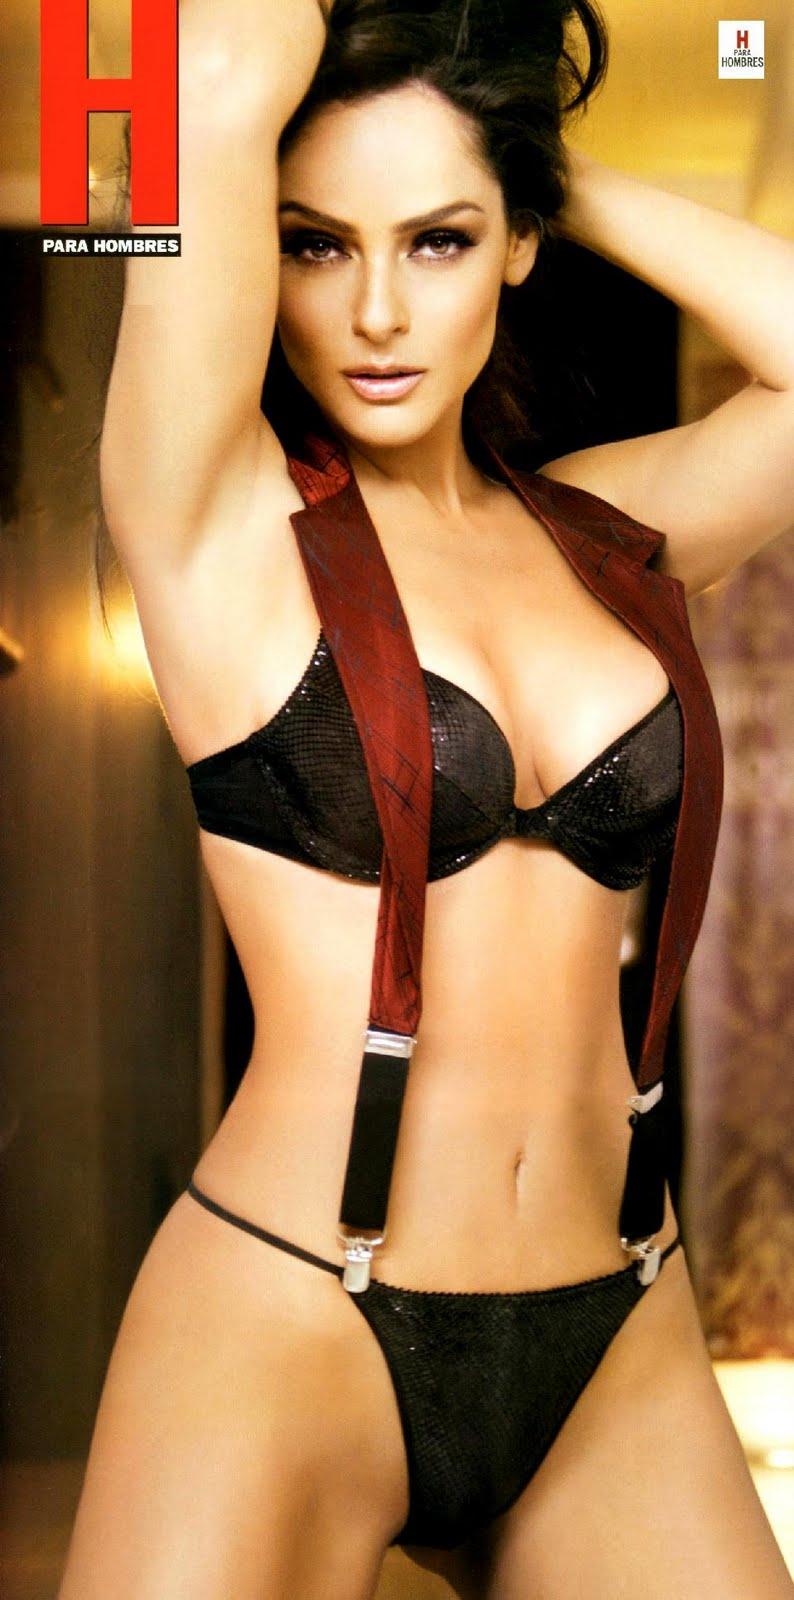 El Rinconcito Sexy Archivos Playboy Echicas Mx | apexwallpapers.com